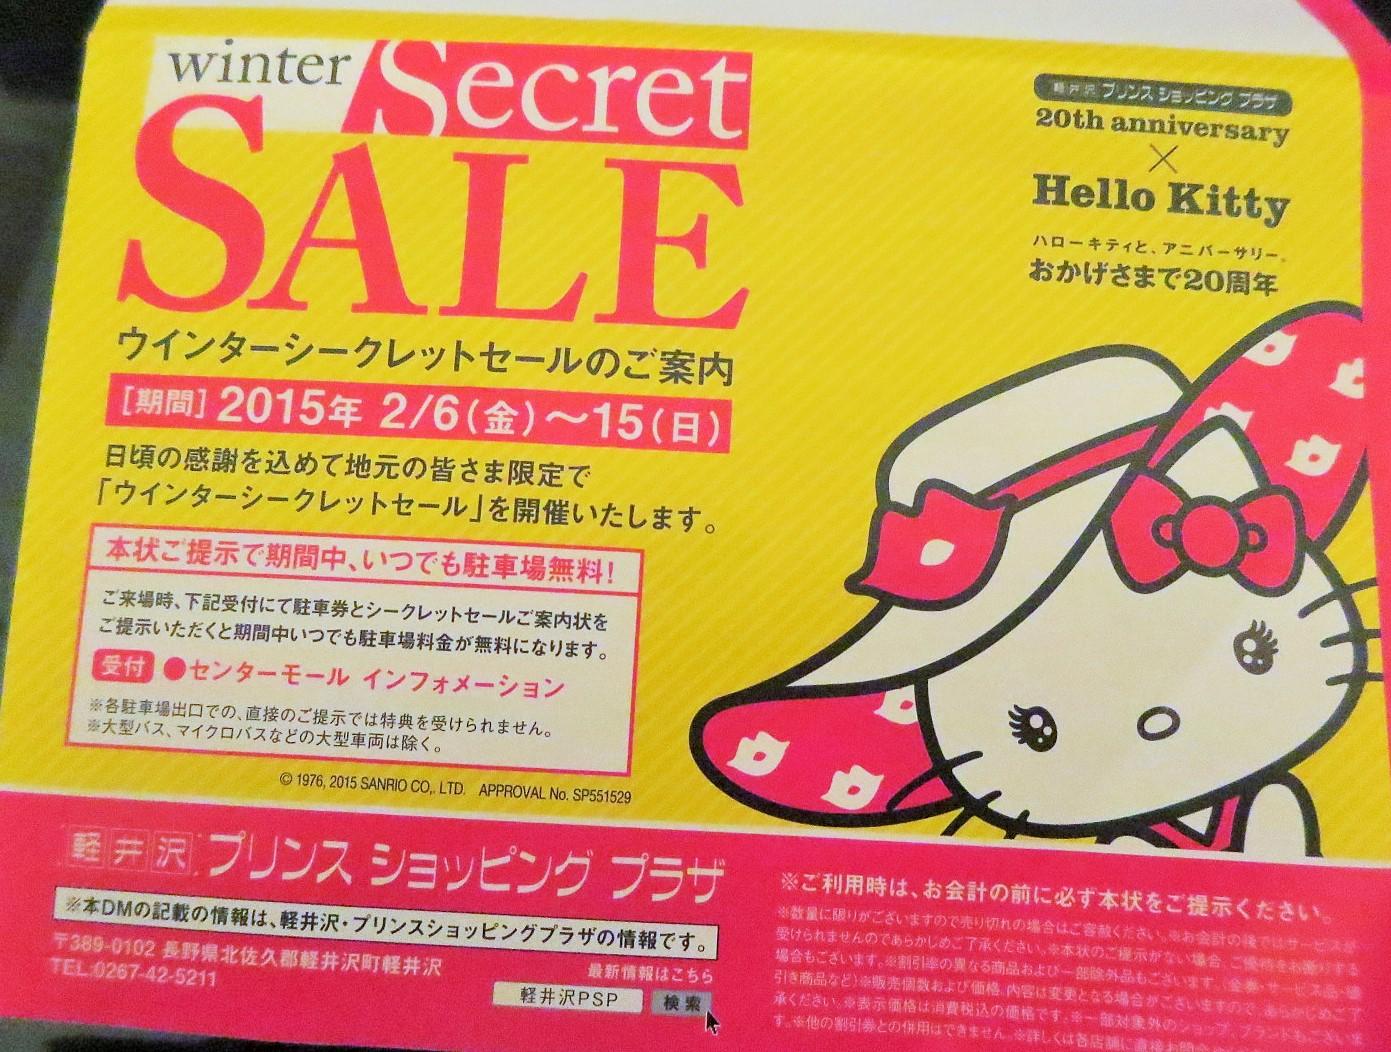 winter Secret SALE☆軽井沢・プリンスショッピングプラザ_f0236260_18561276.jpg